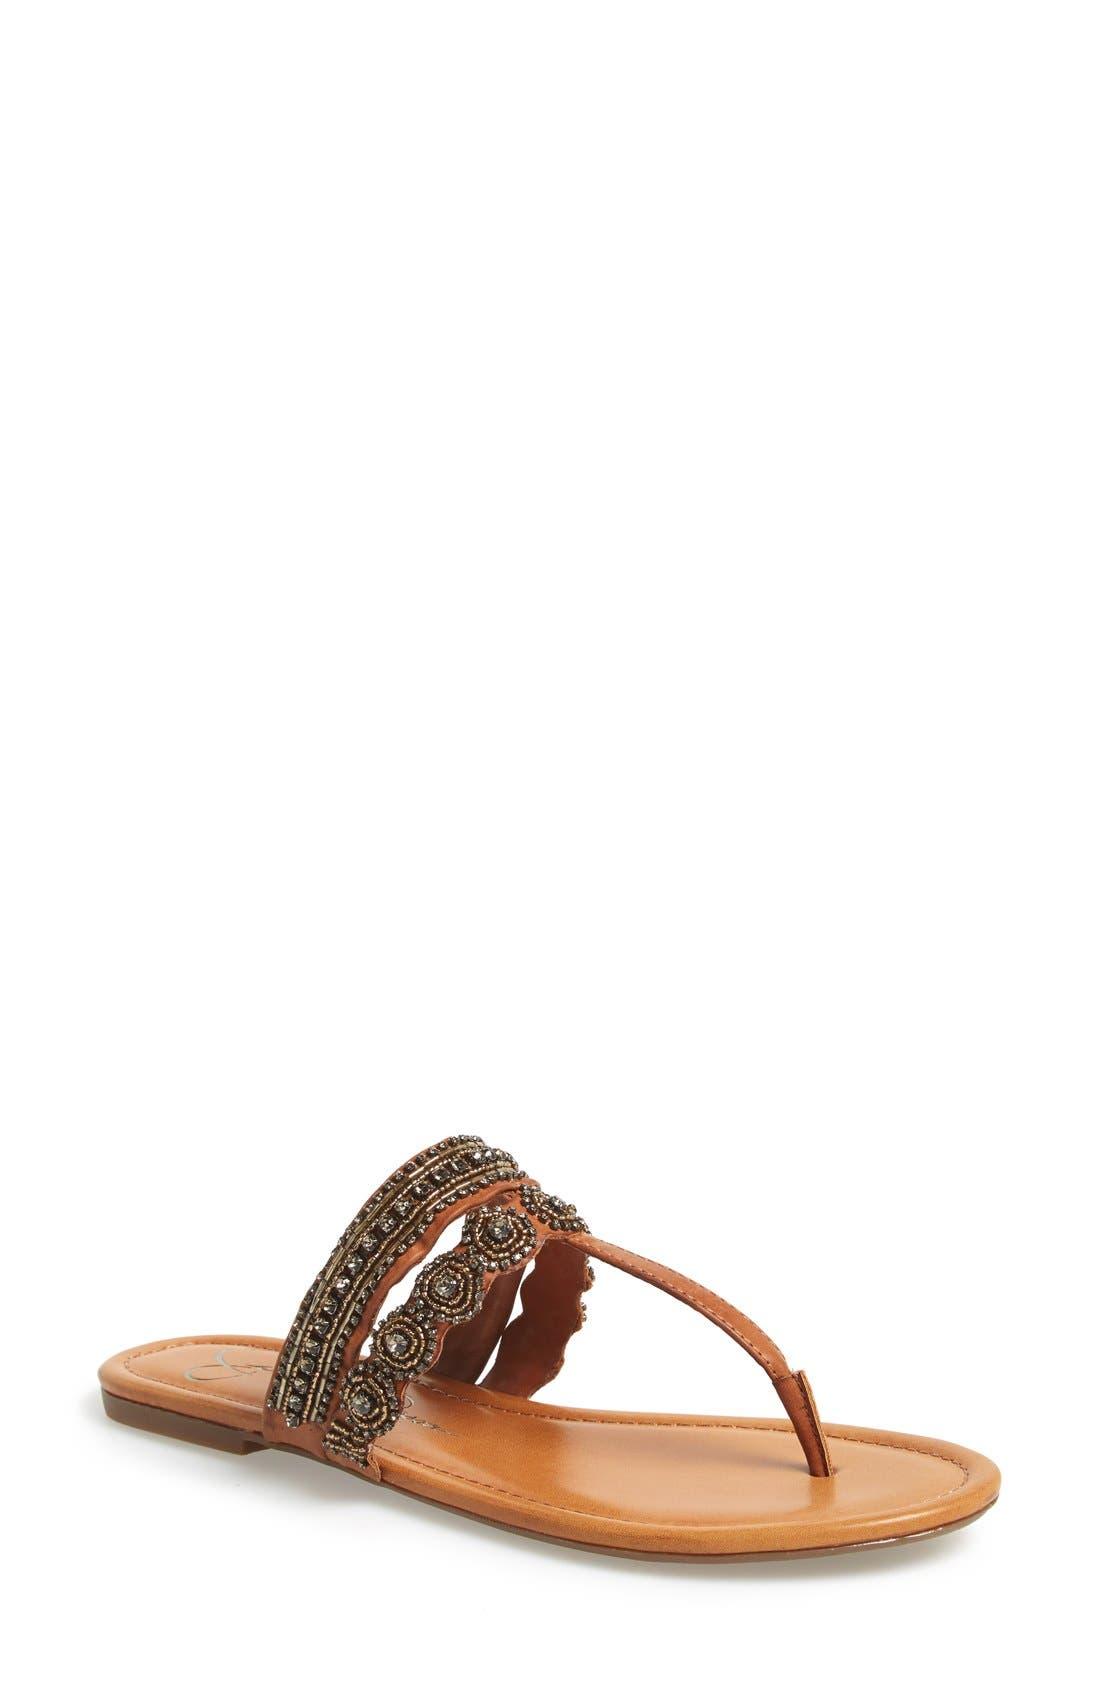 Main Image - Jessica Simpson 'Roelle' Embellished Sandal (Women)